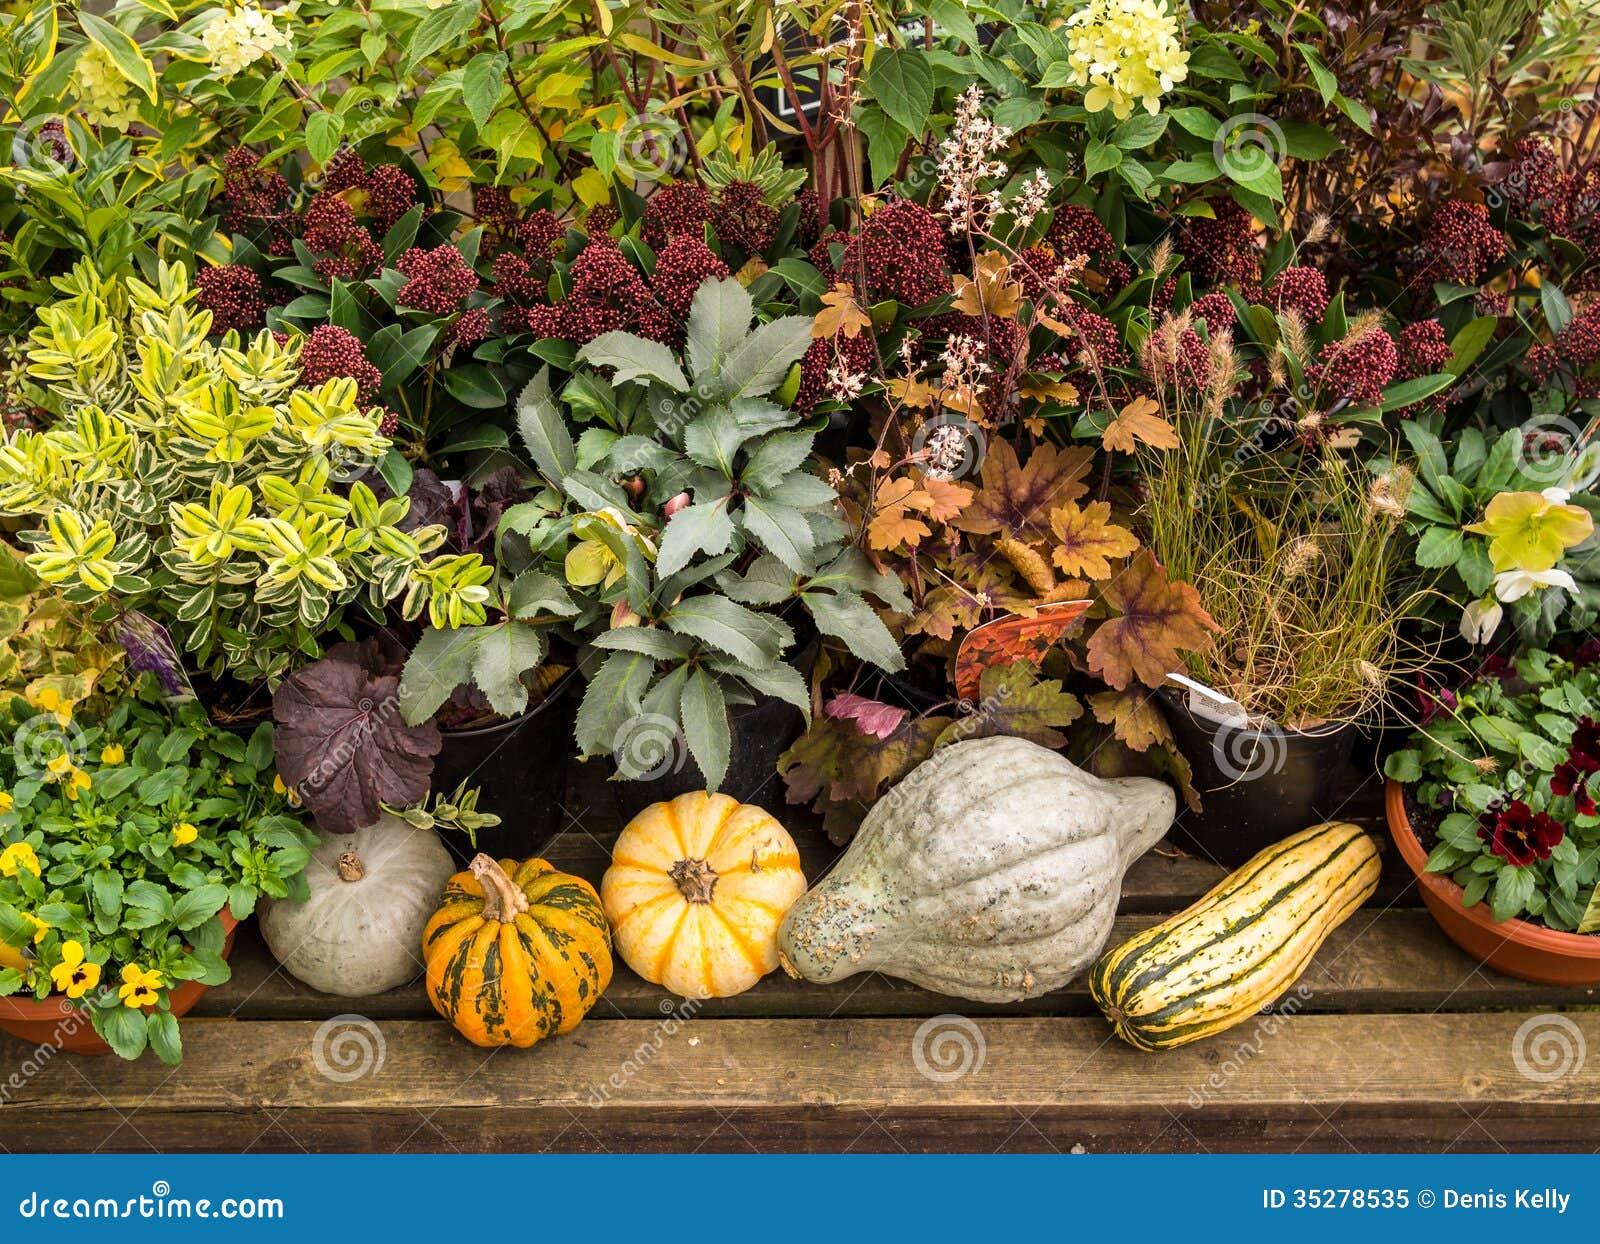 Autumn Vegetable Plants Garden Stock Image Image Of Hebe Rural